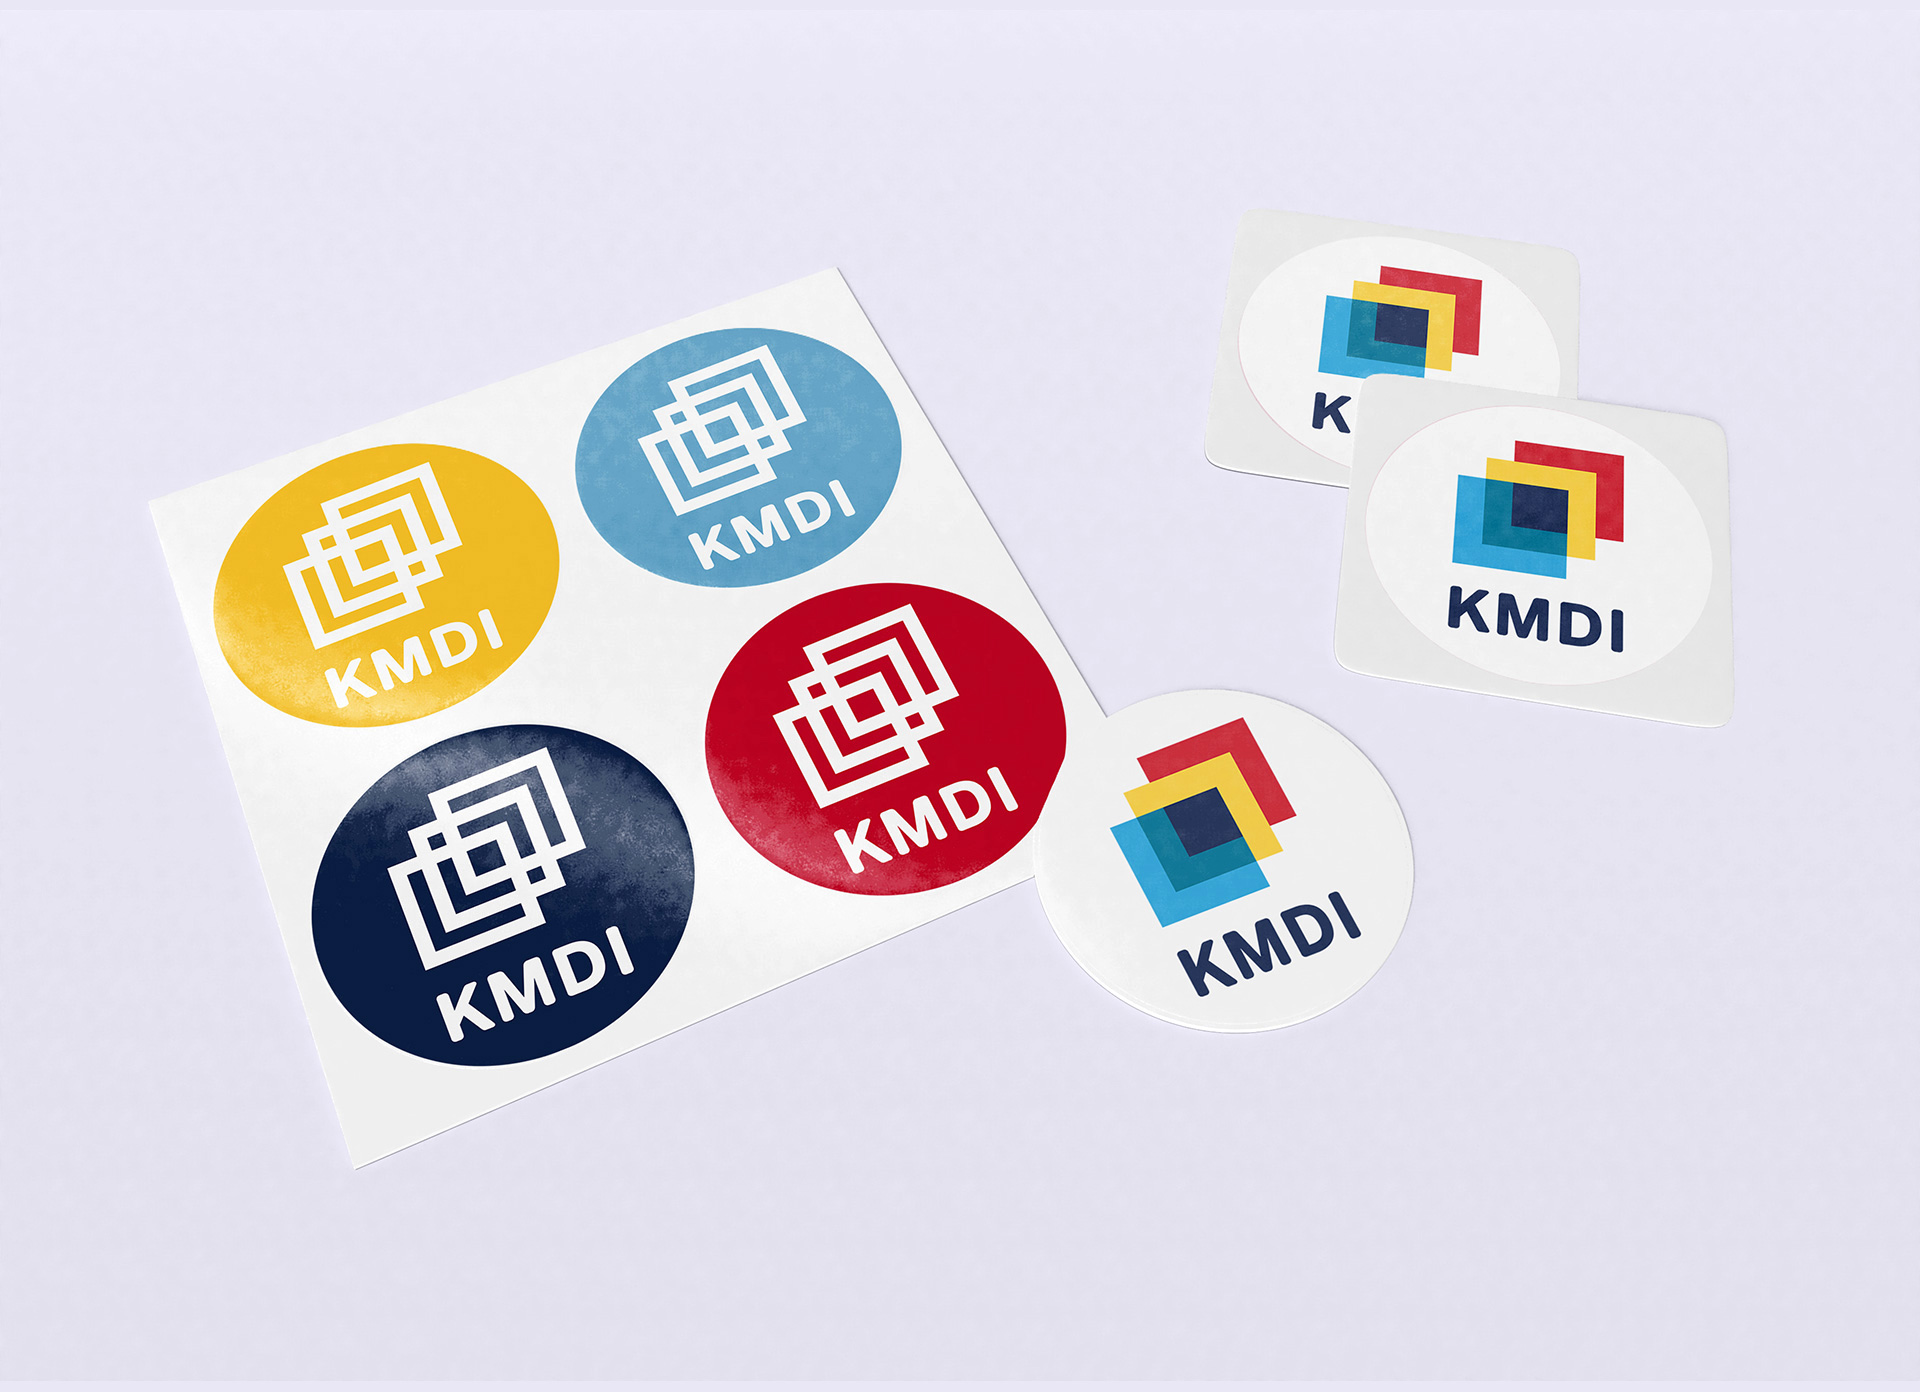 KMDI stickers